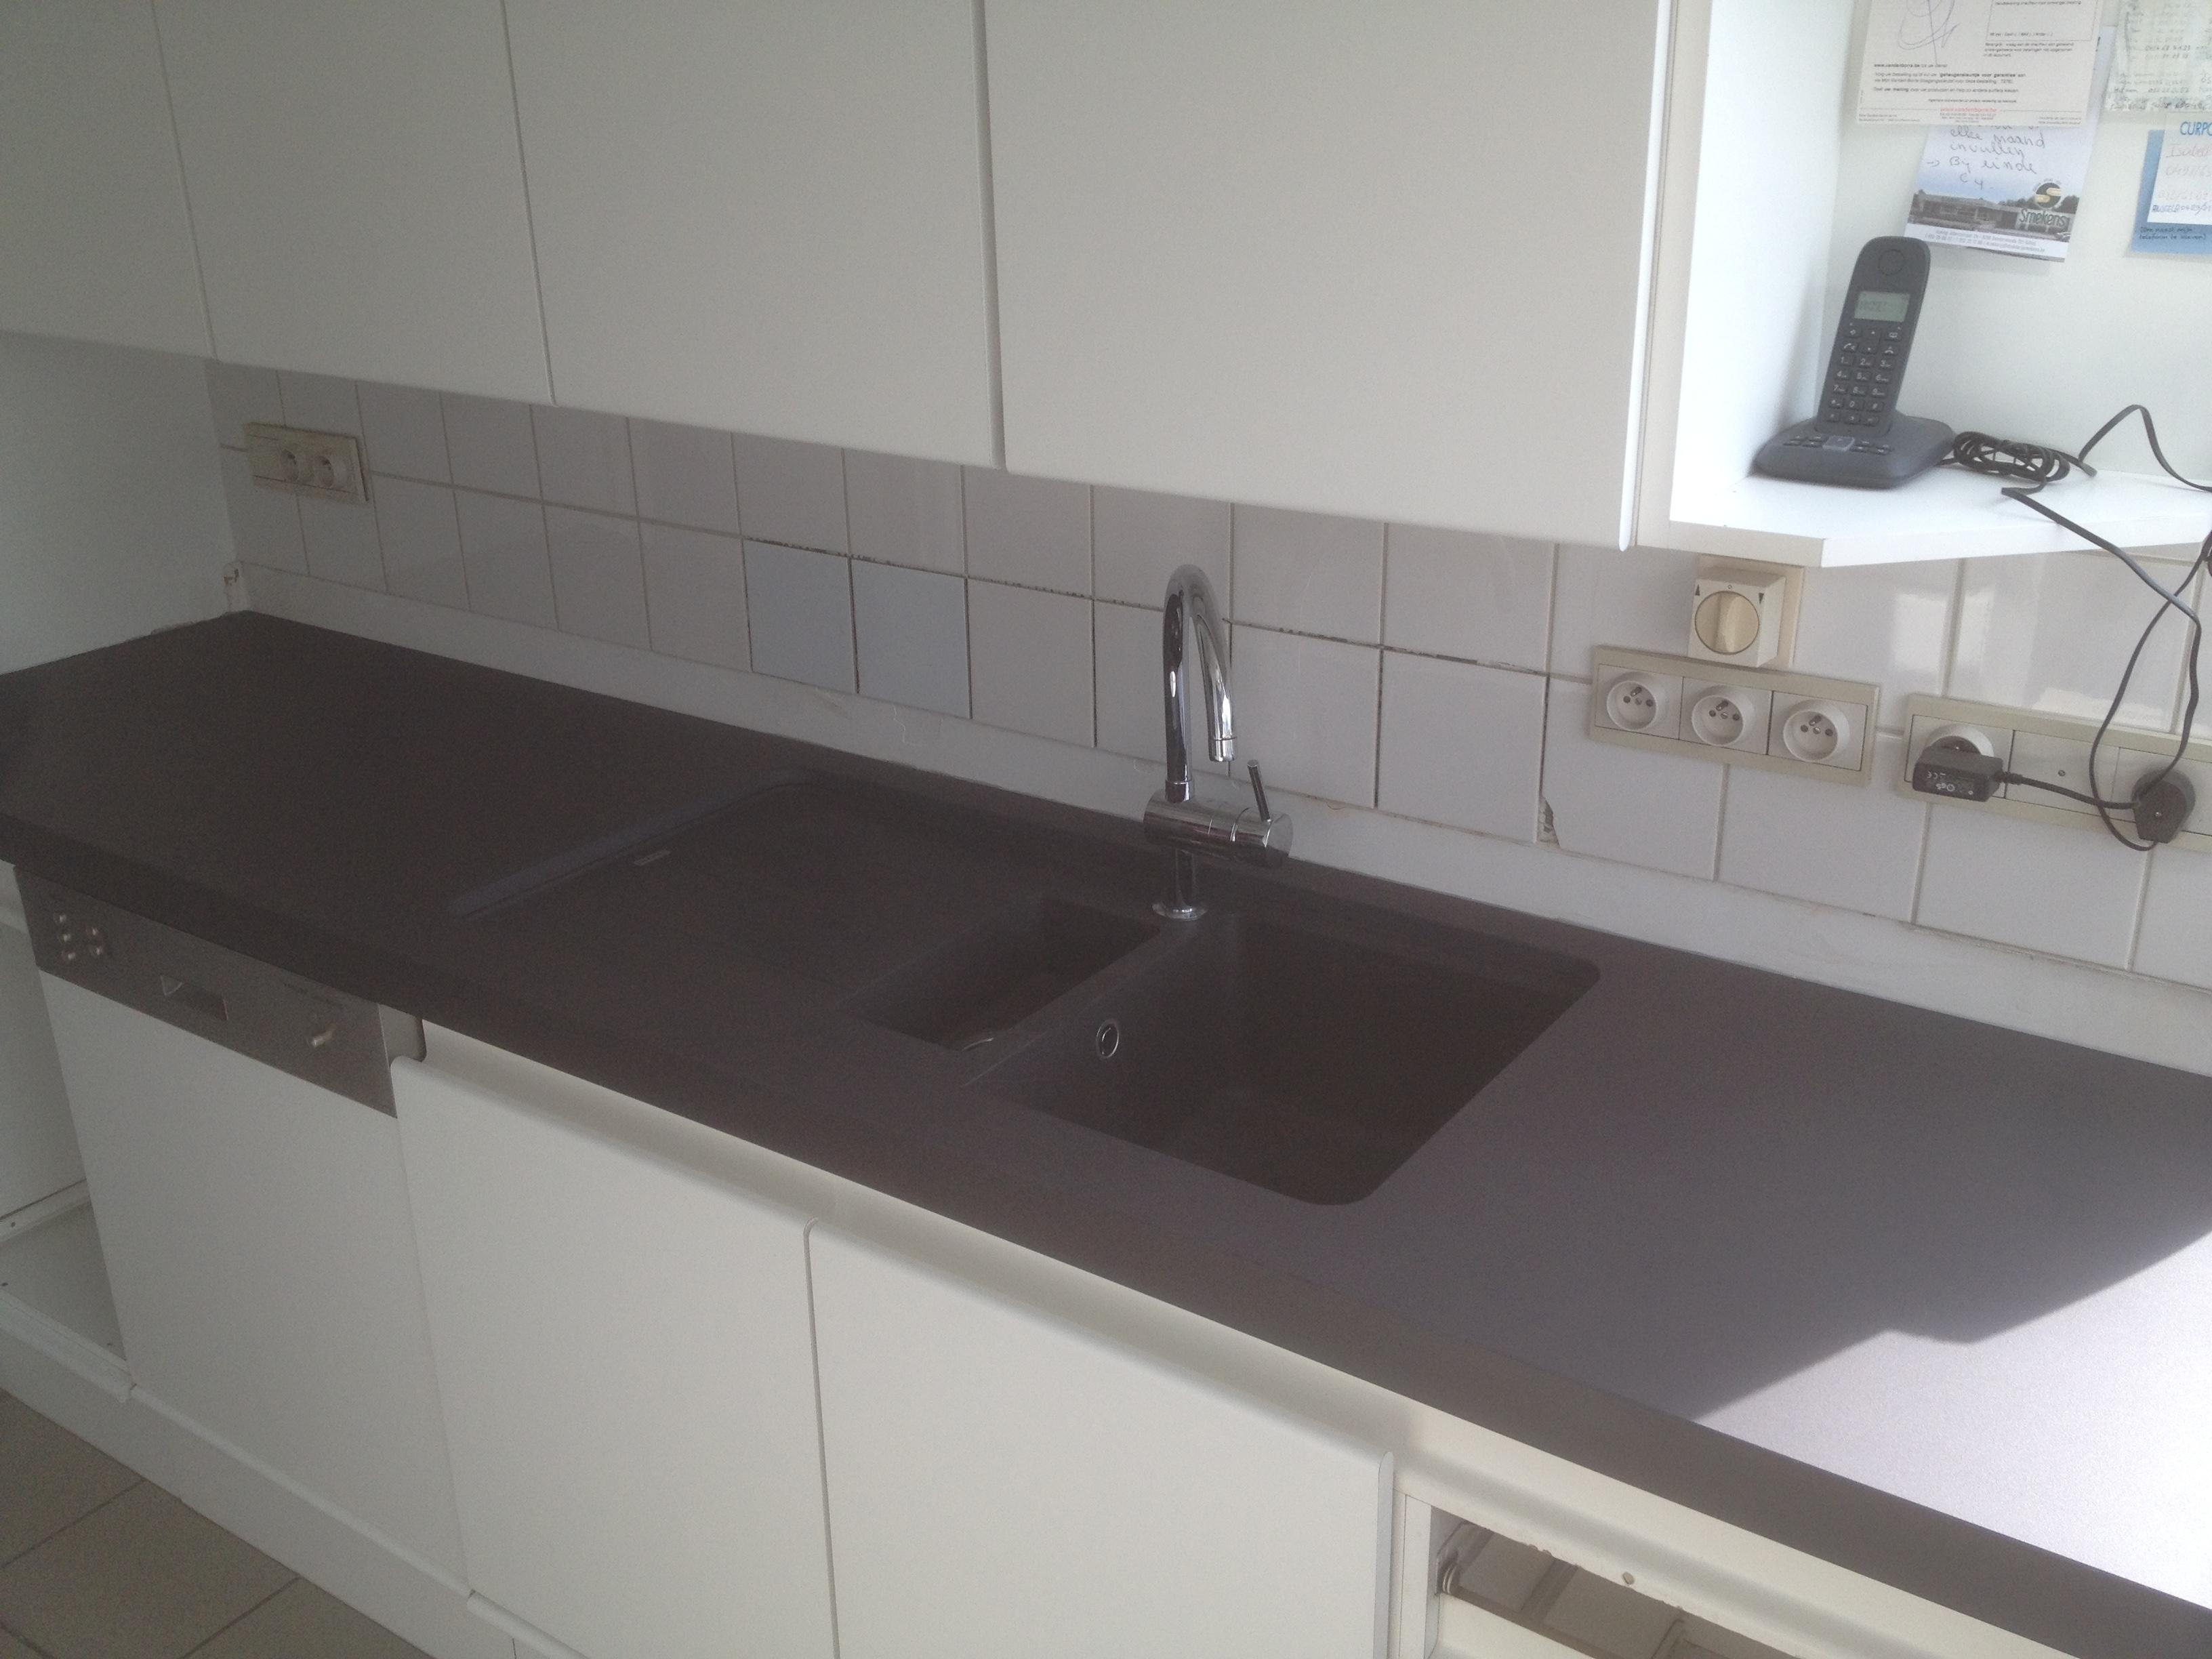 E Bad Sanitair : Sanitair bad lababo s alles nieuw te koop dehands be